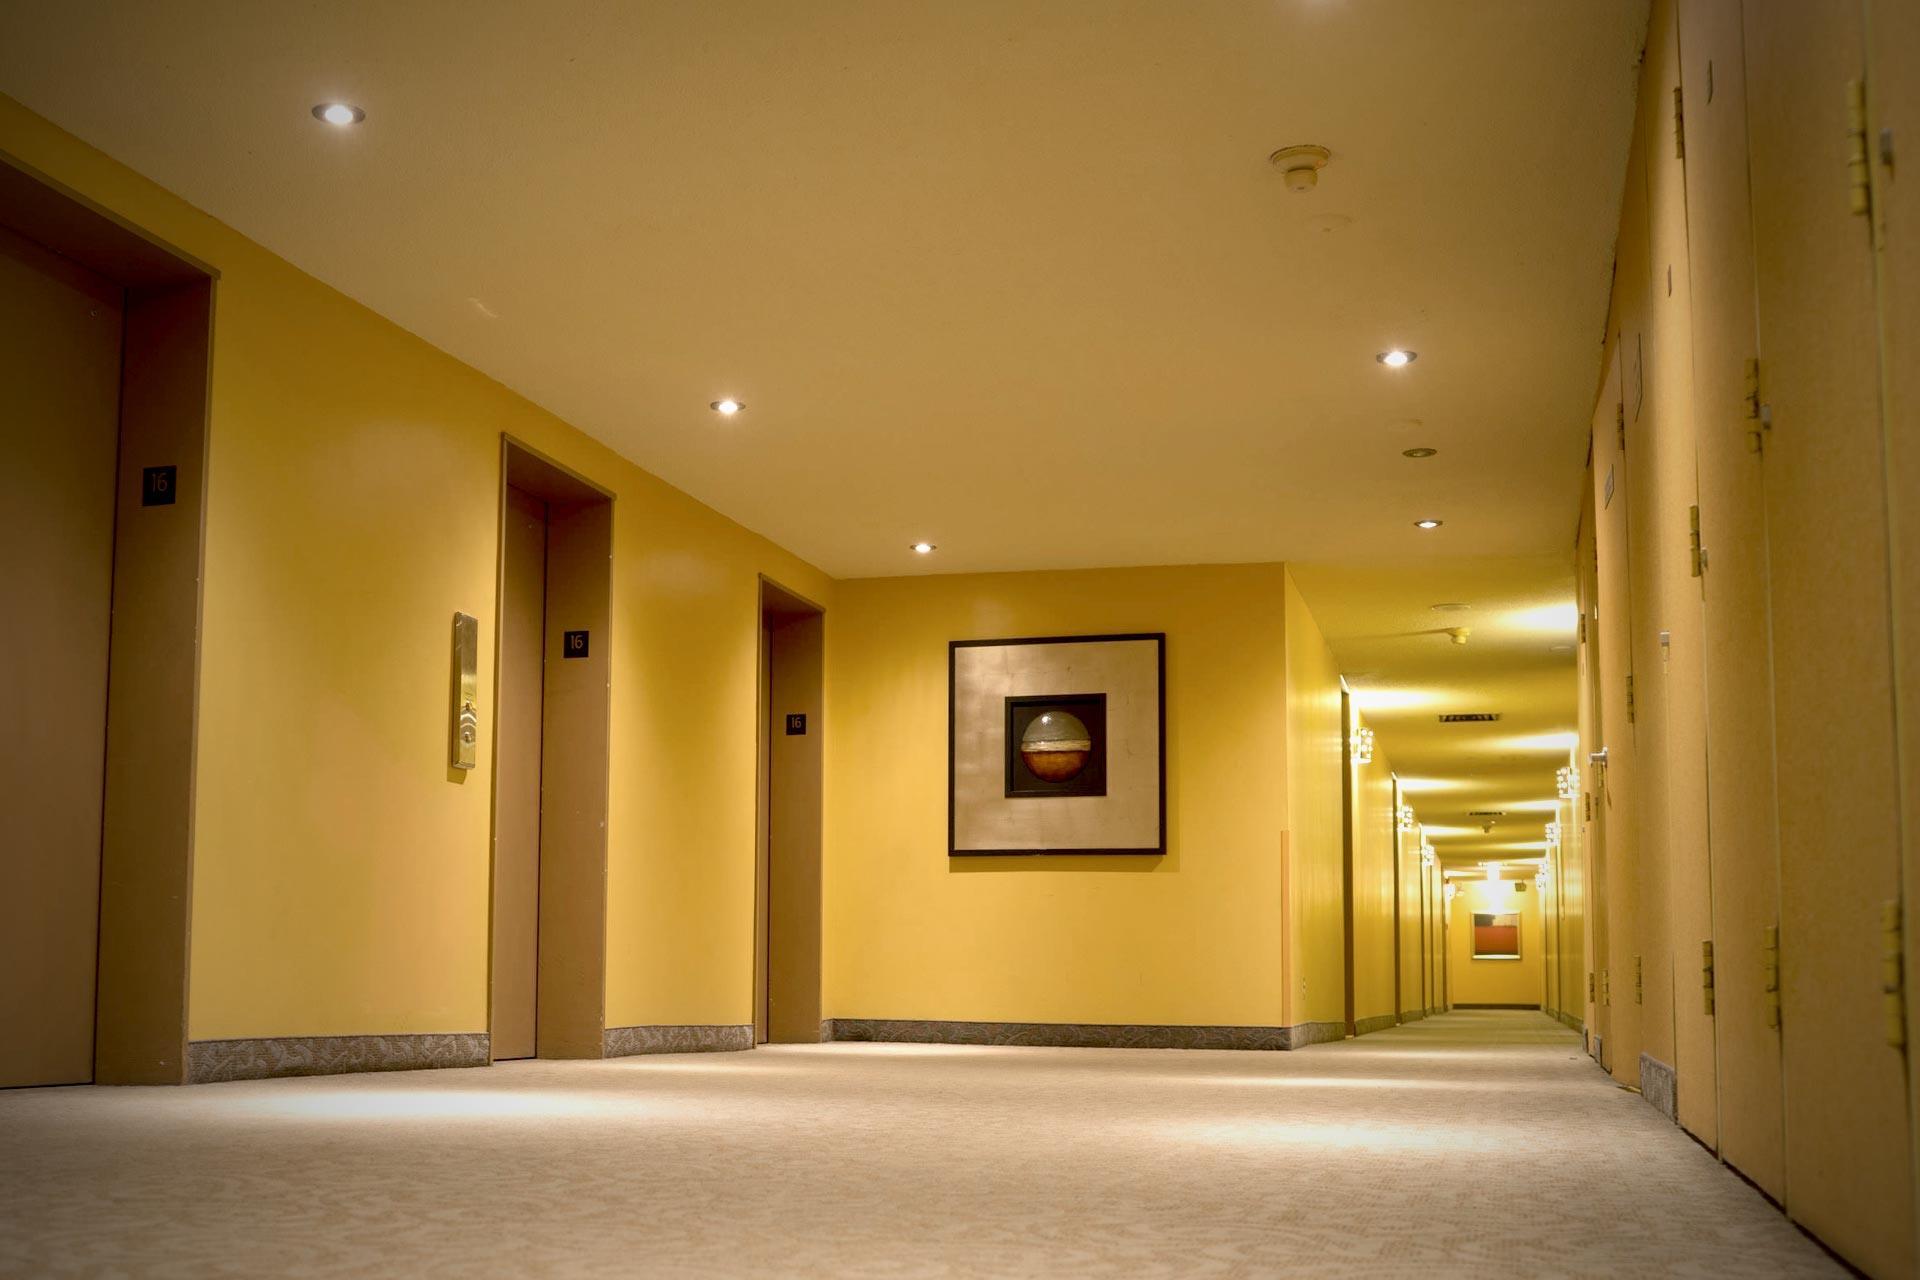 amenities_5